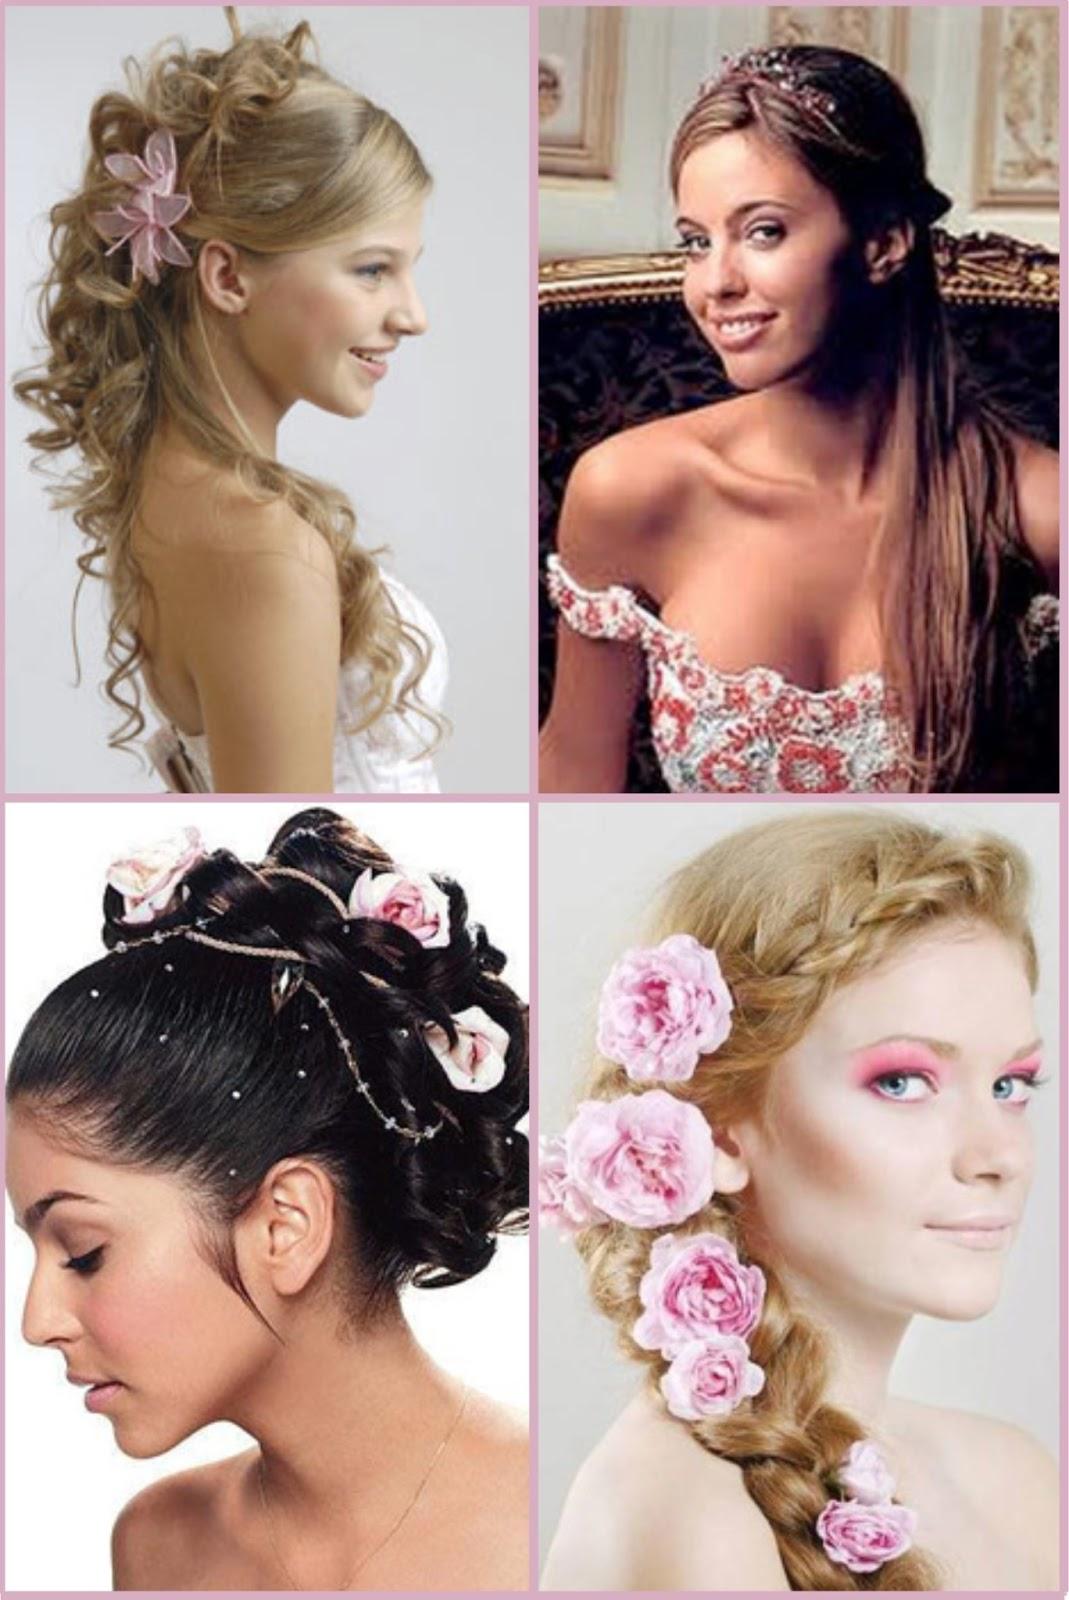 Peinados Para 15 Anos Tendencias De Peinados Para Tu Fiesta De 15